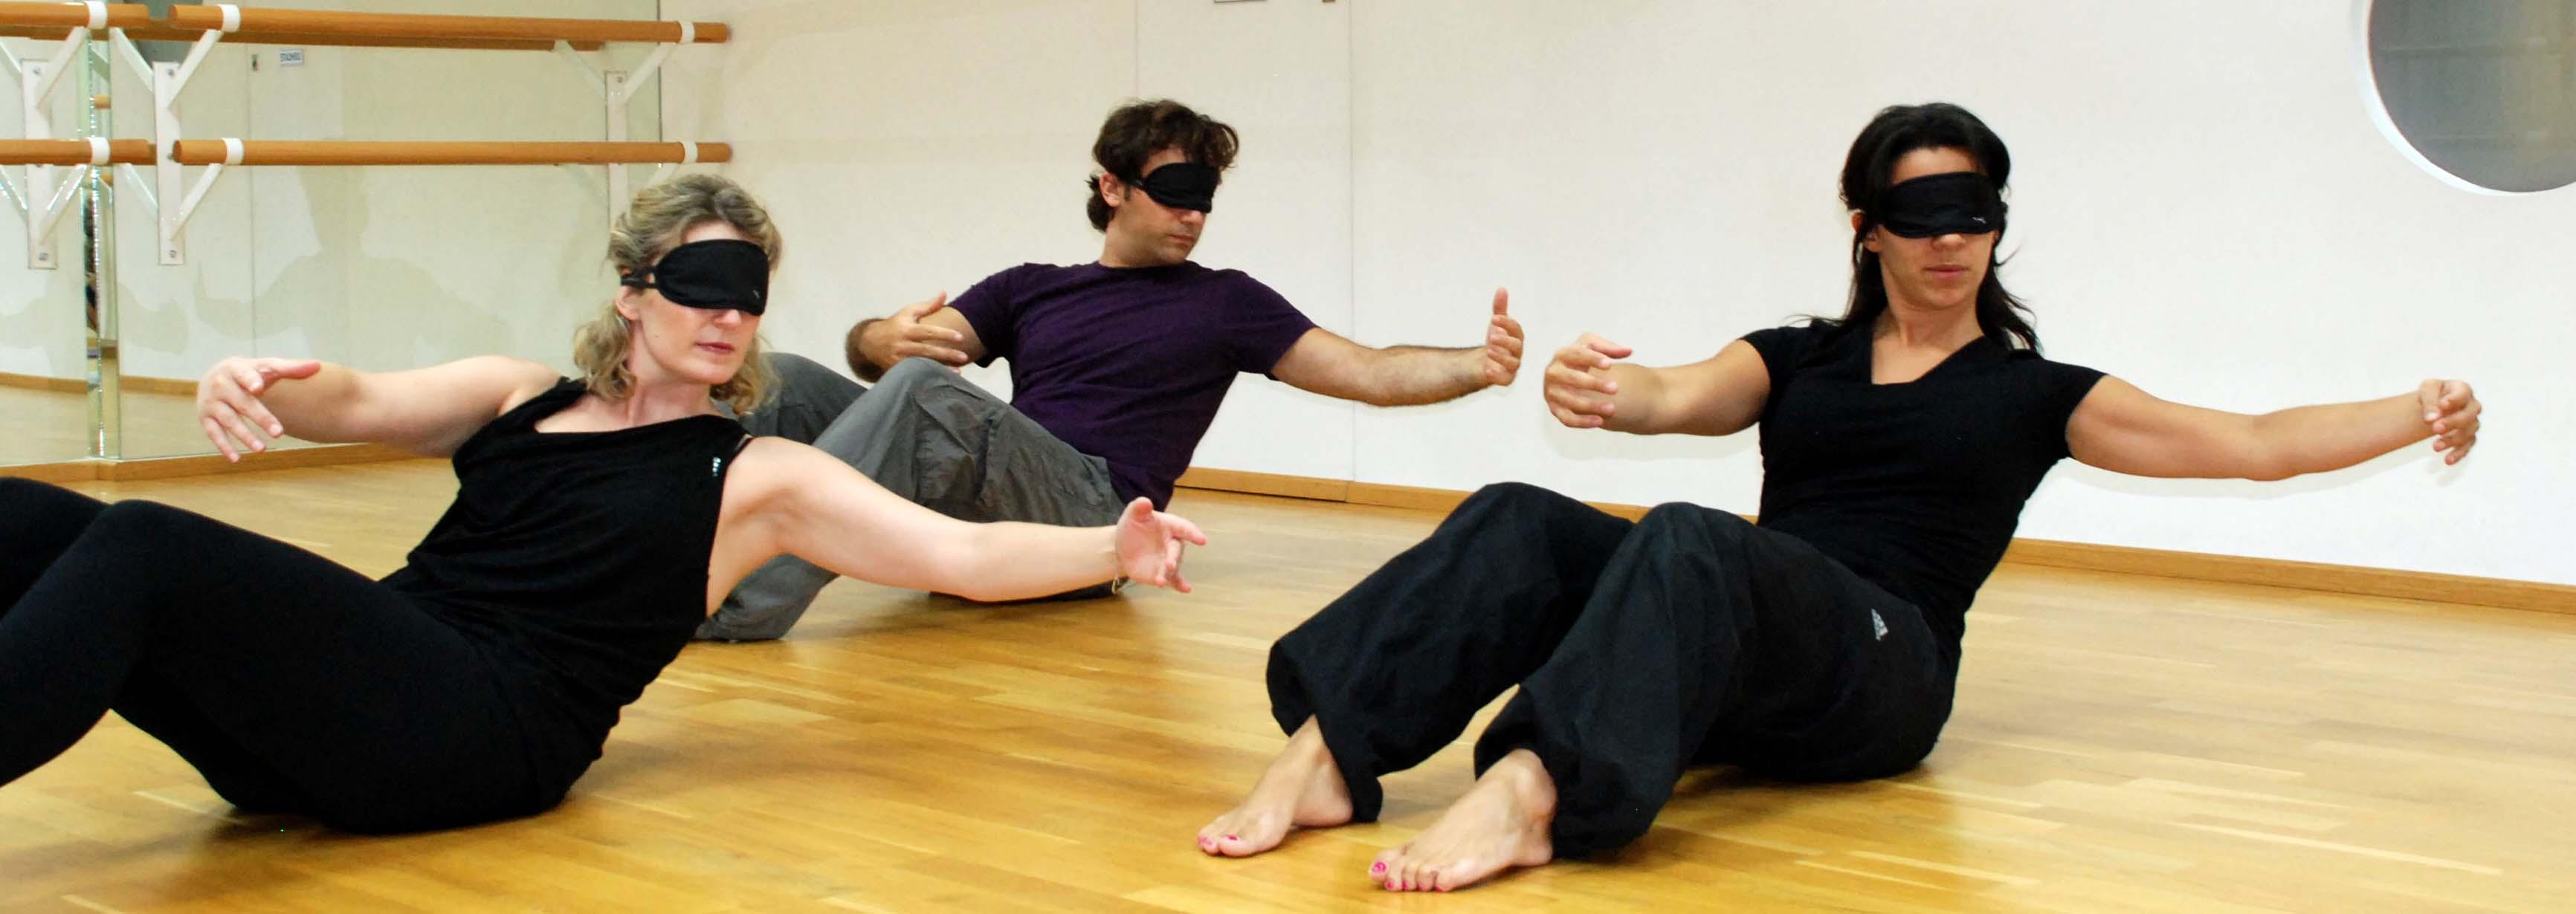 blindfolded pilates at modus vivendi